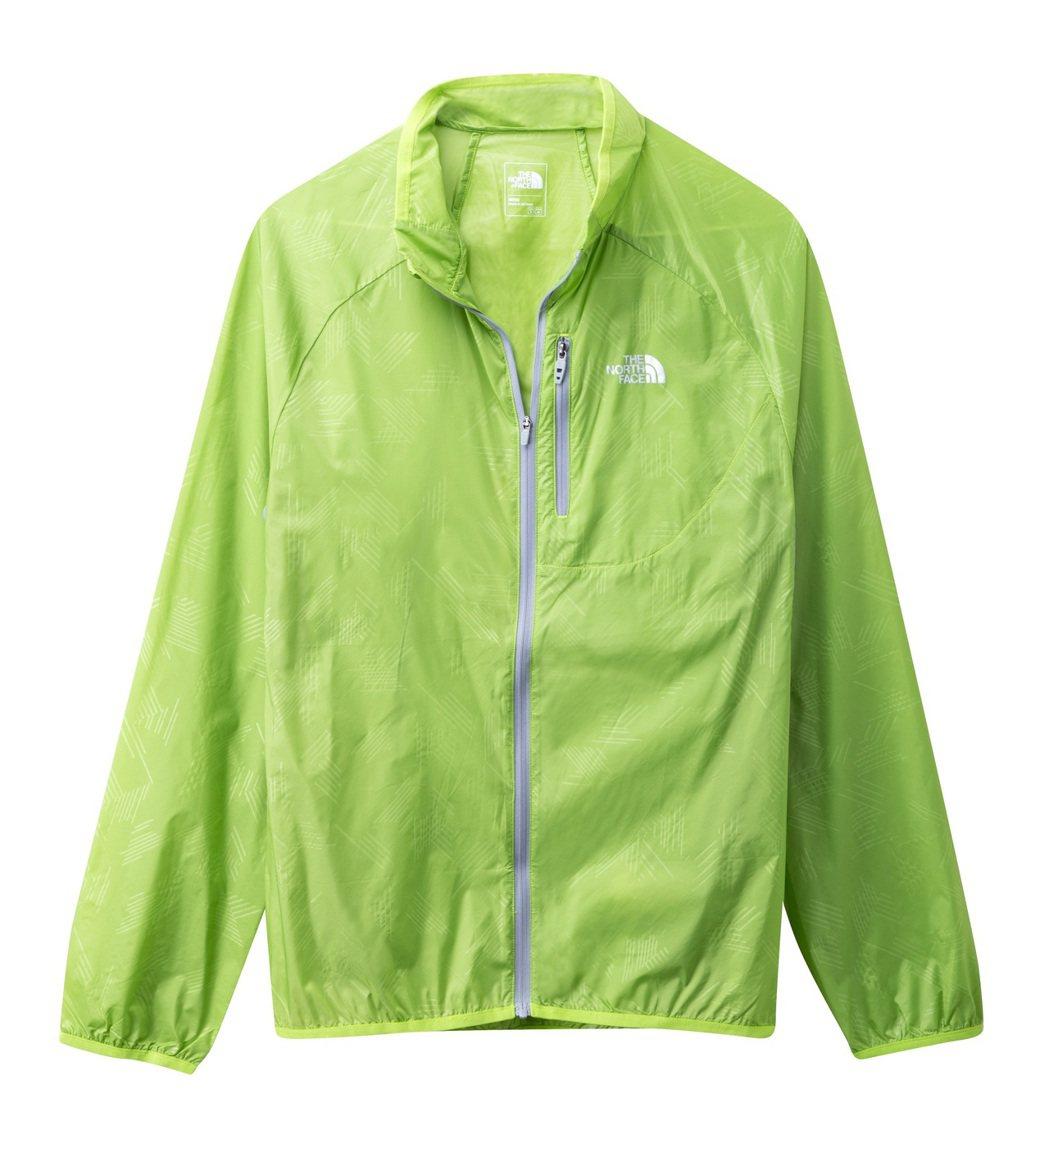 The North Face戶外休閒服飾夏日抗UV外套 ,都是父親節送禮熱門選擇...